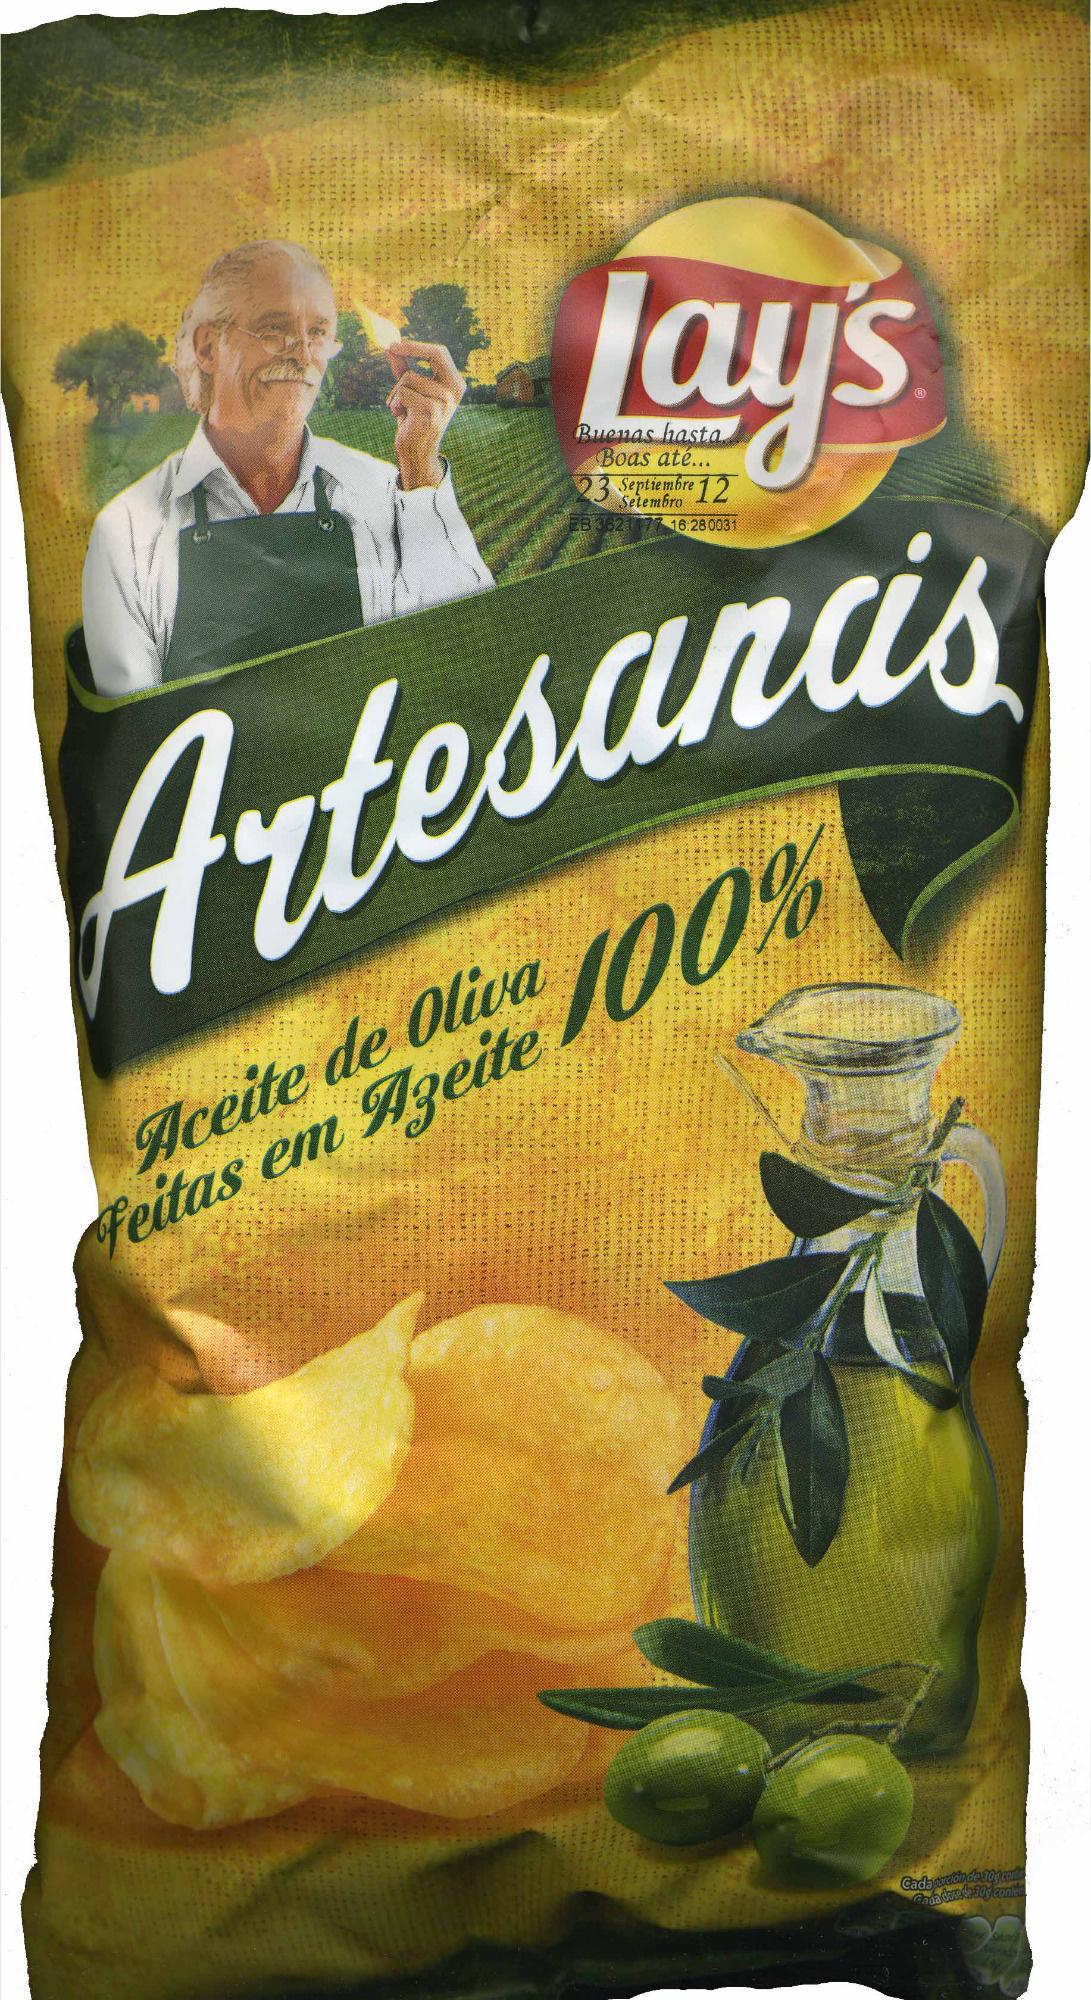 Patatas fritas lisas artesanas - Product - es